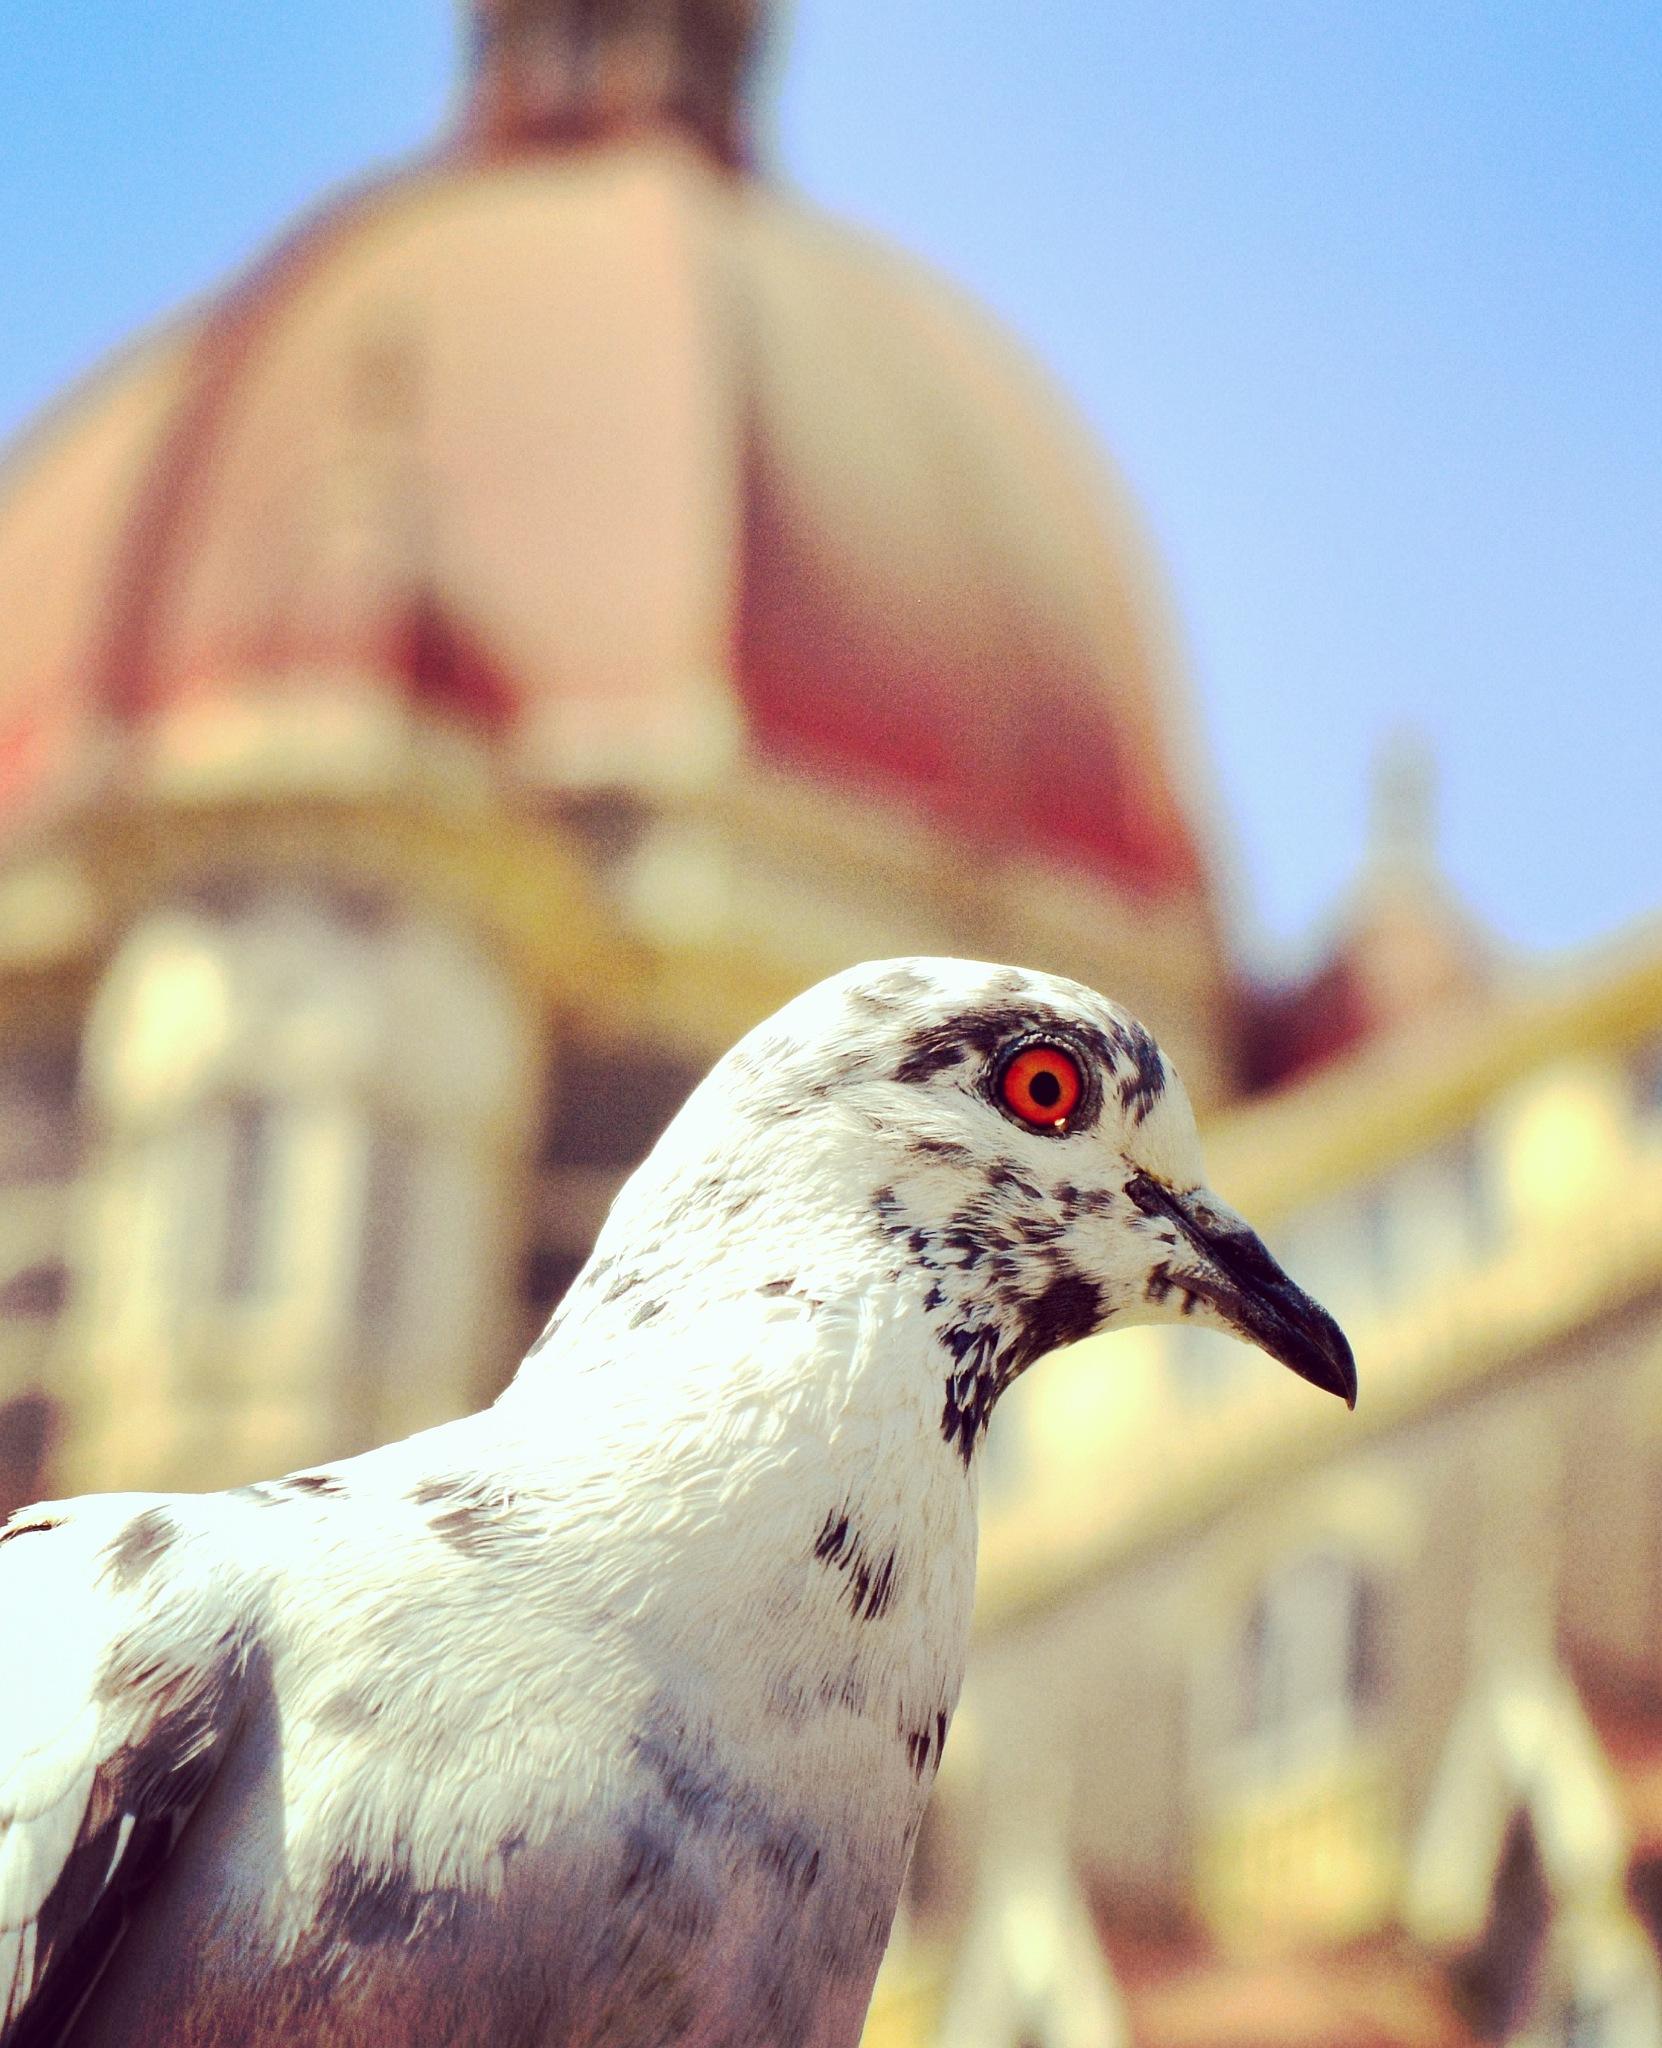 pigeon by Nayan Jain